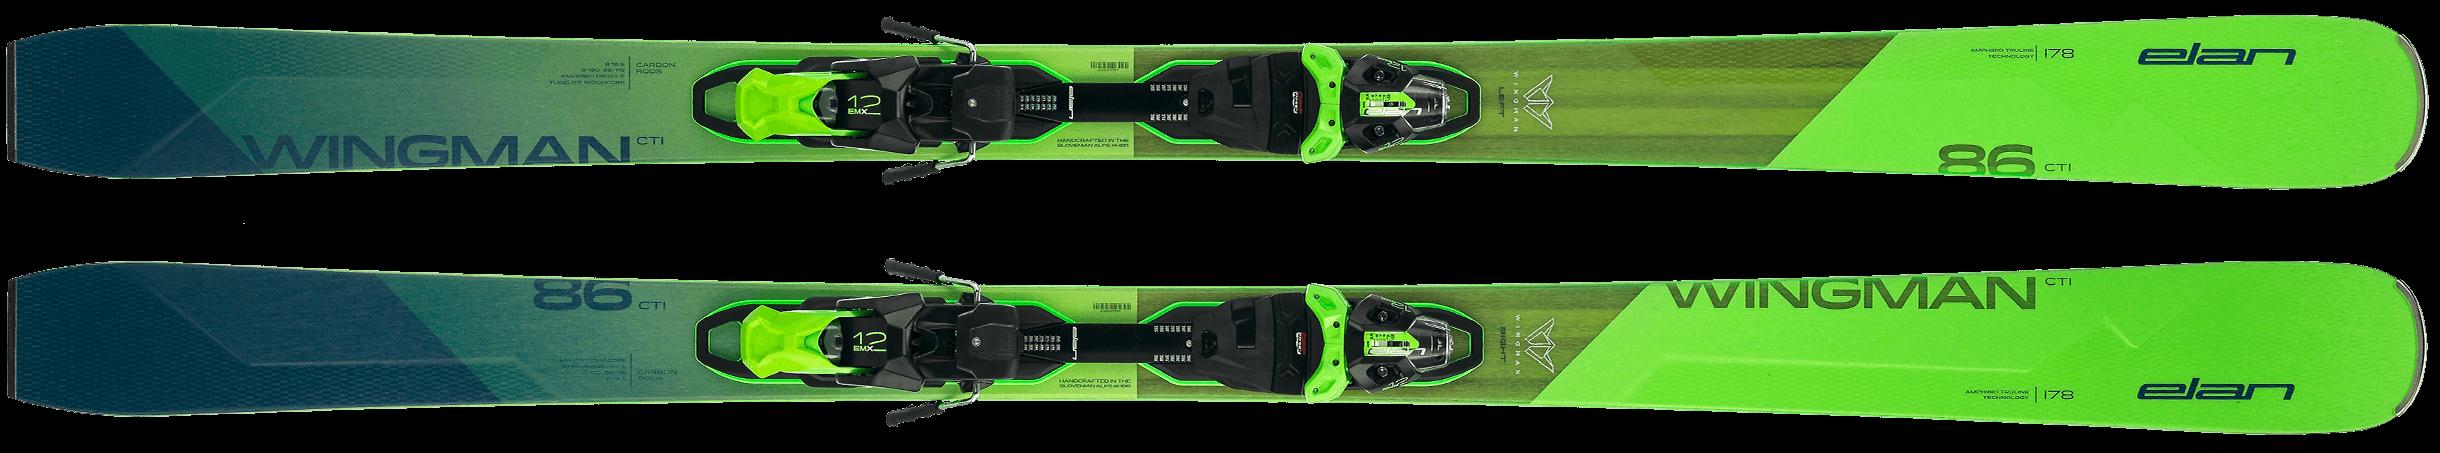 Wingman 86 CTi Fusion X